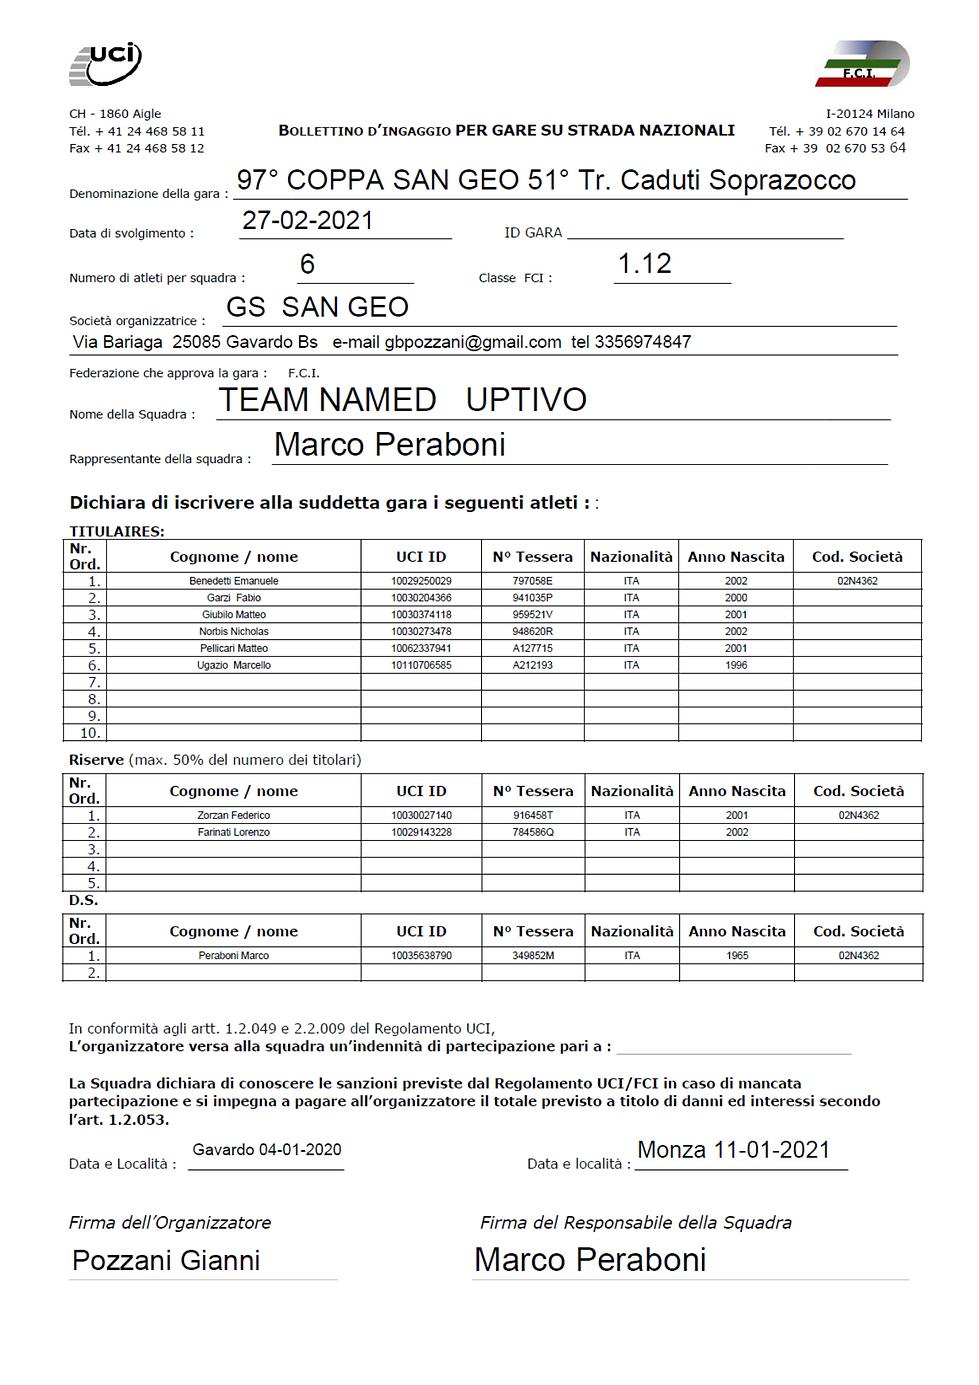 bollettino Team Named Uptivo.png